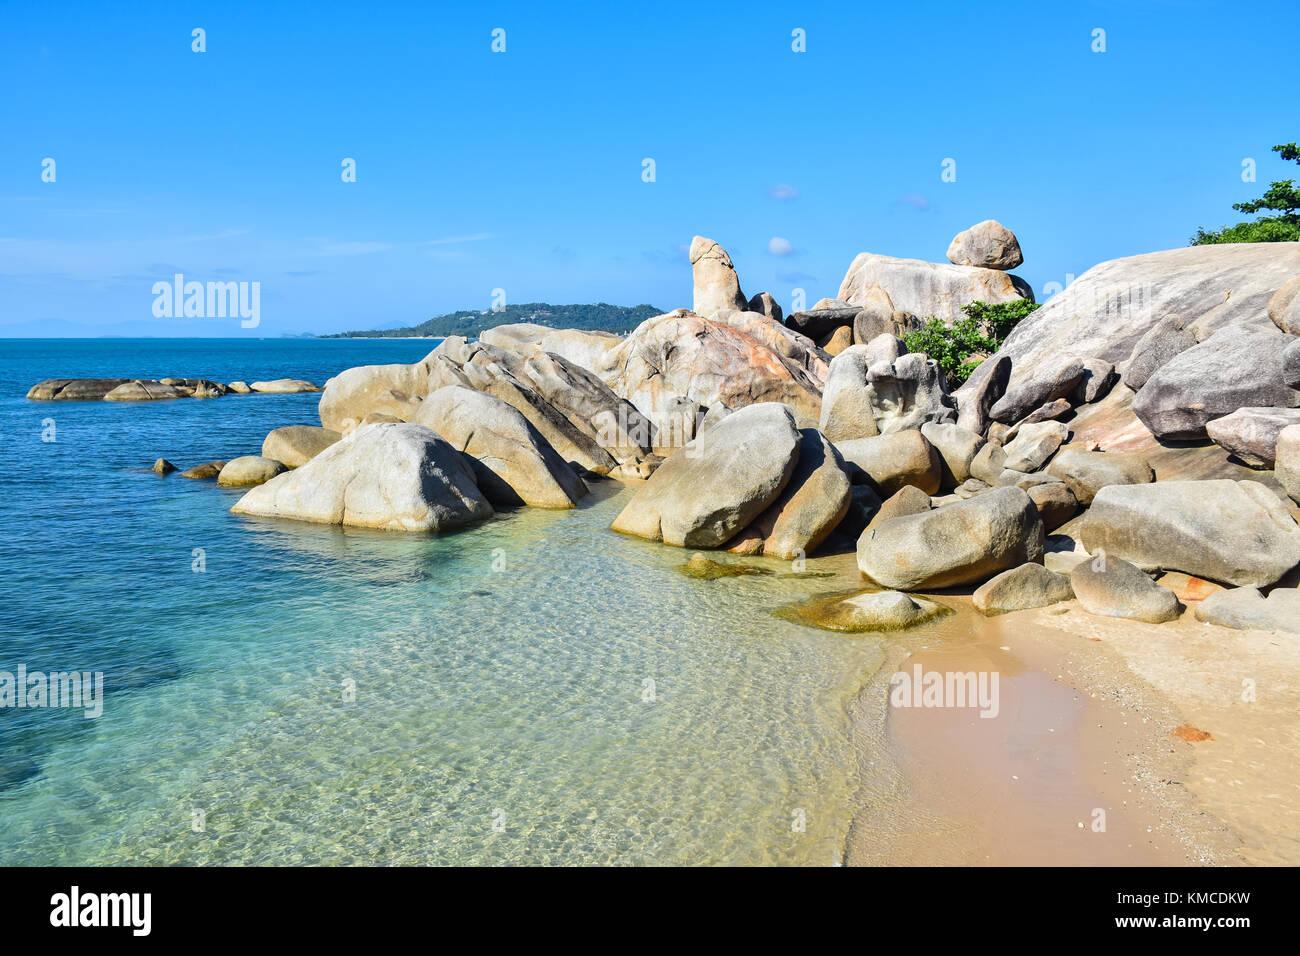 Rocky seashore beach Hin Ta Hin Yai, famous landmark at Samui island, Thailand - Stock Image